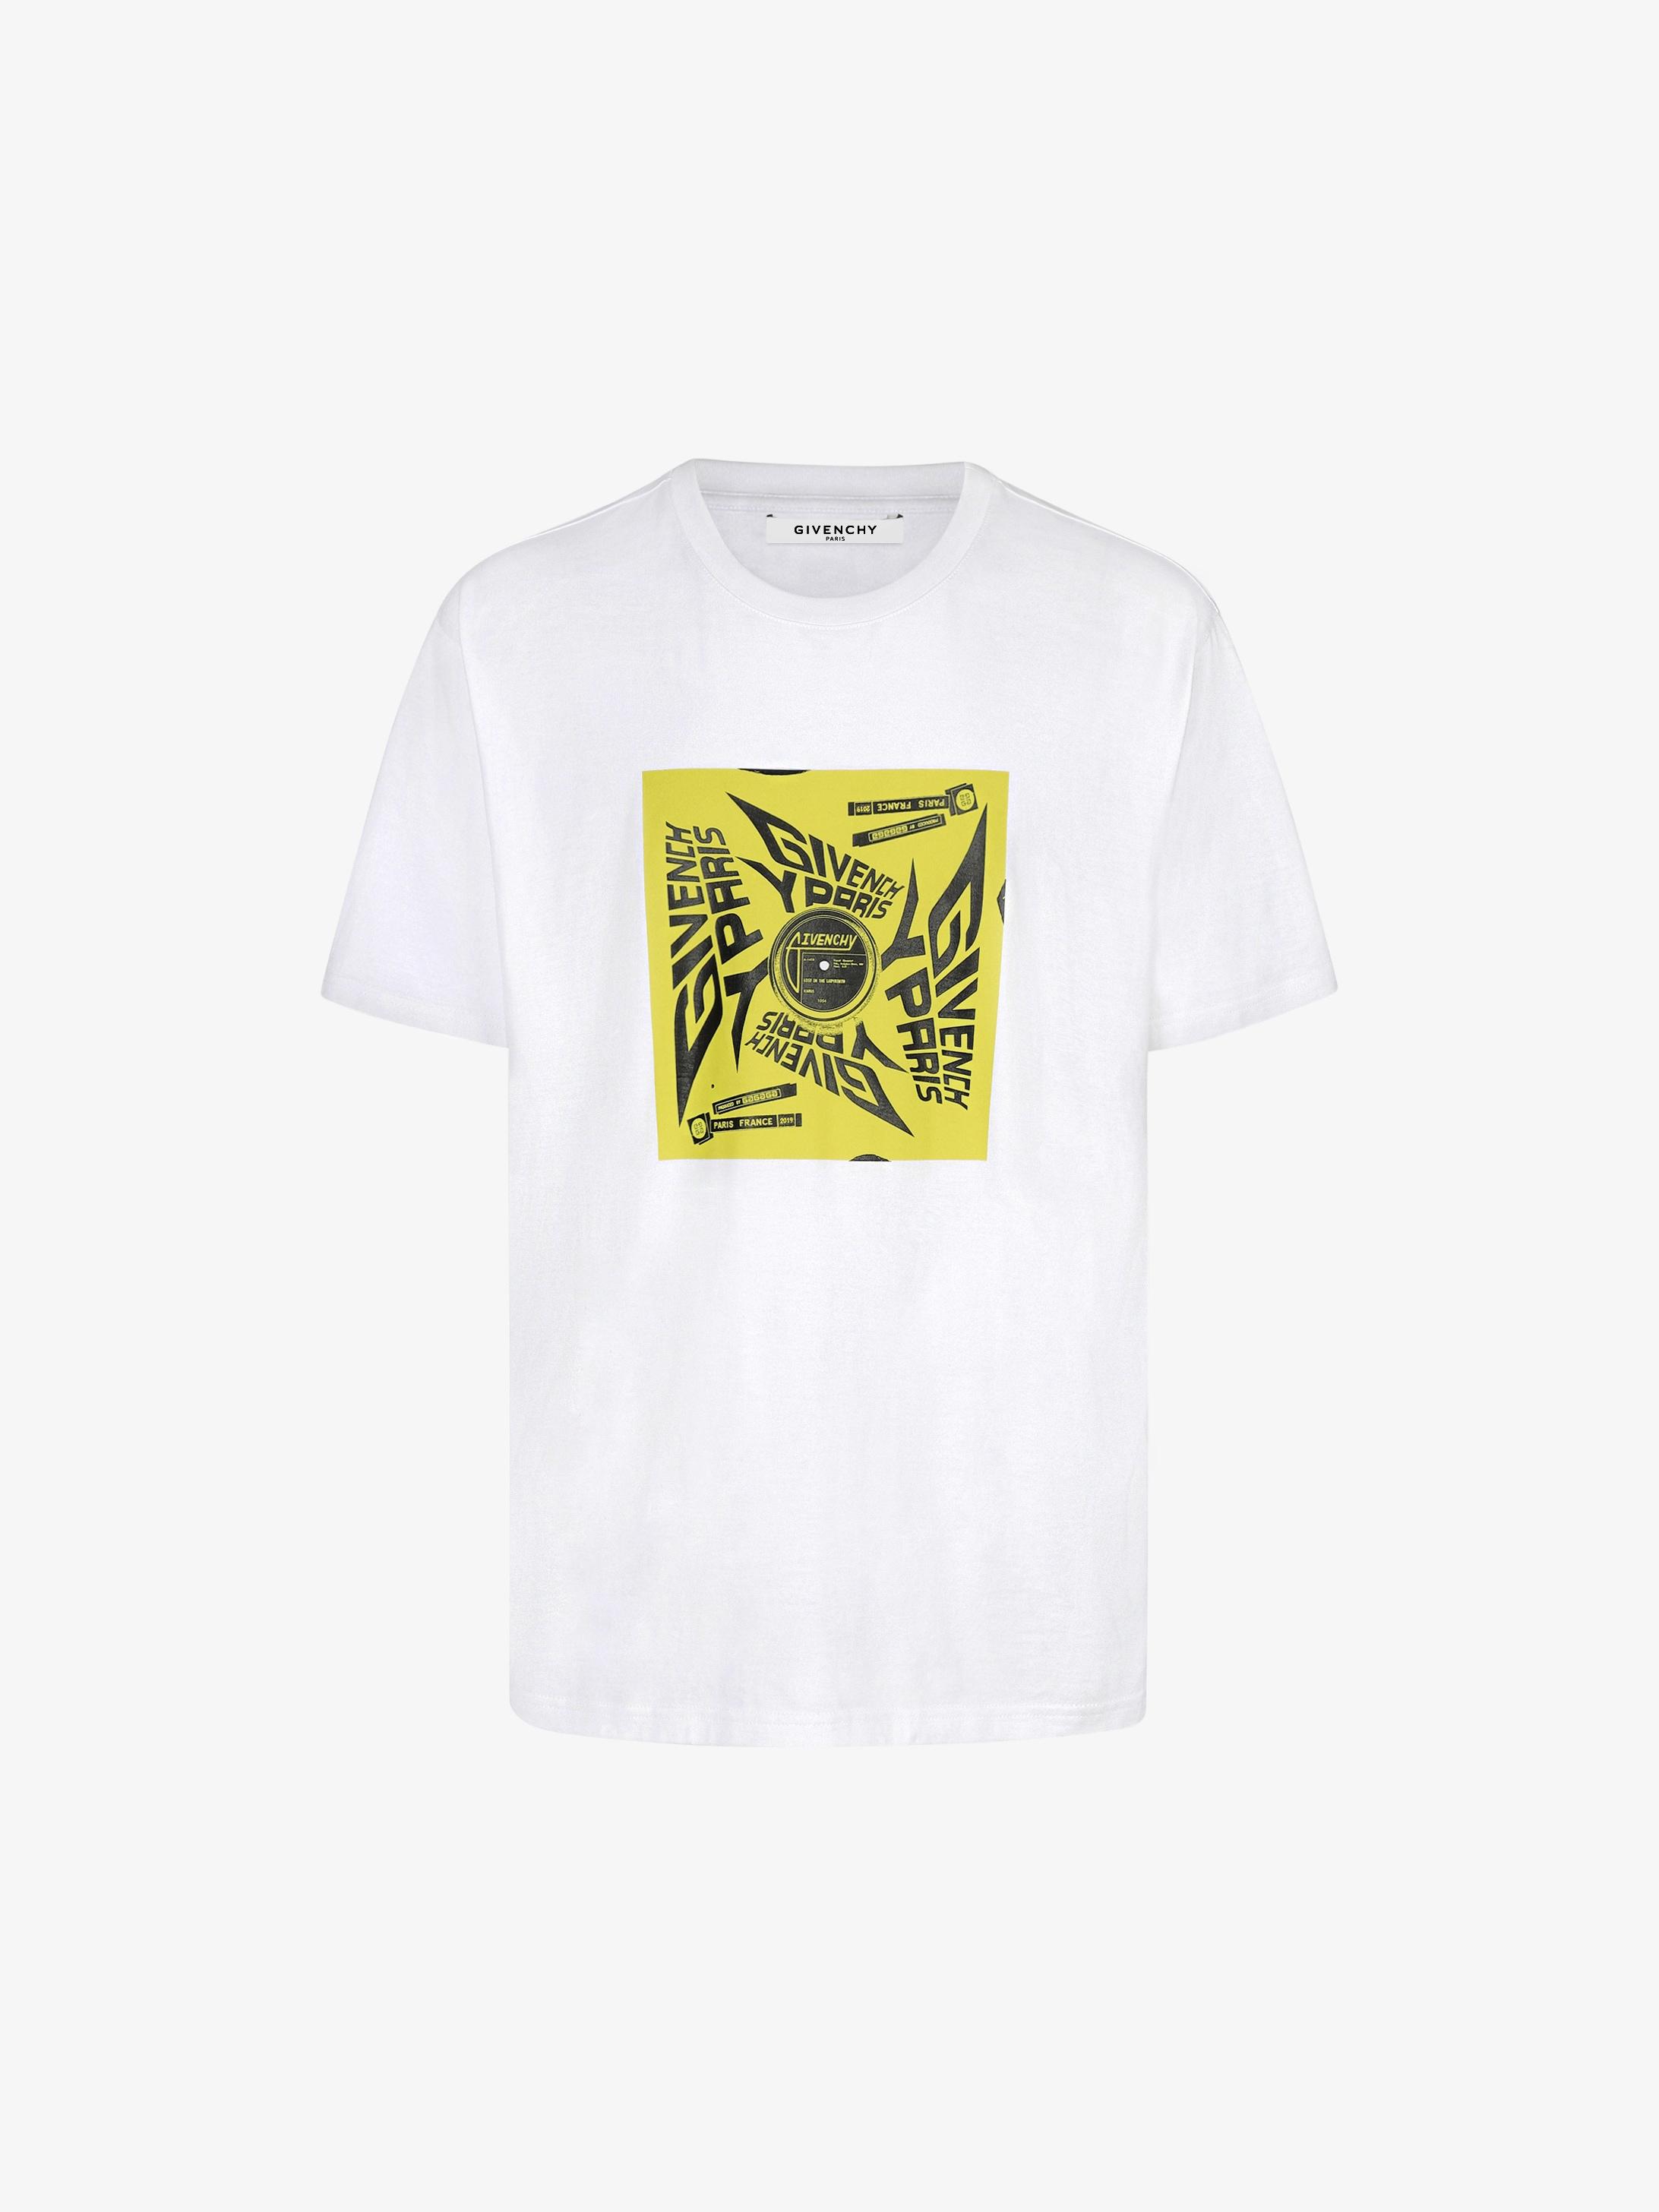 GIVENCHY PARIS sun printed T-shirt